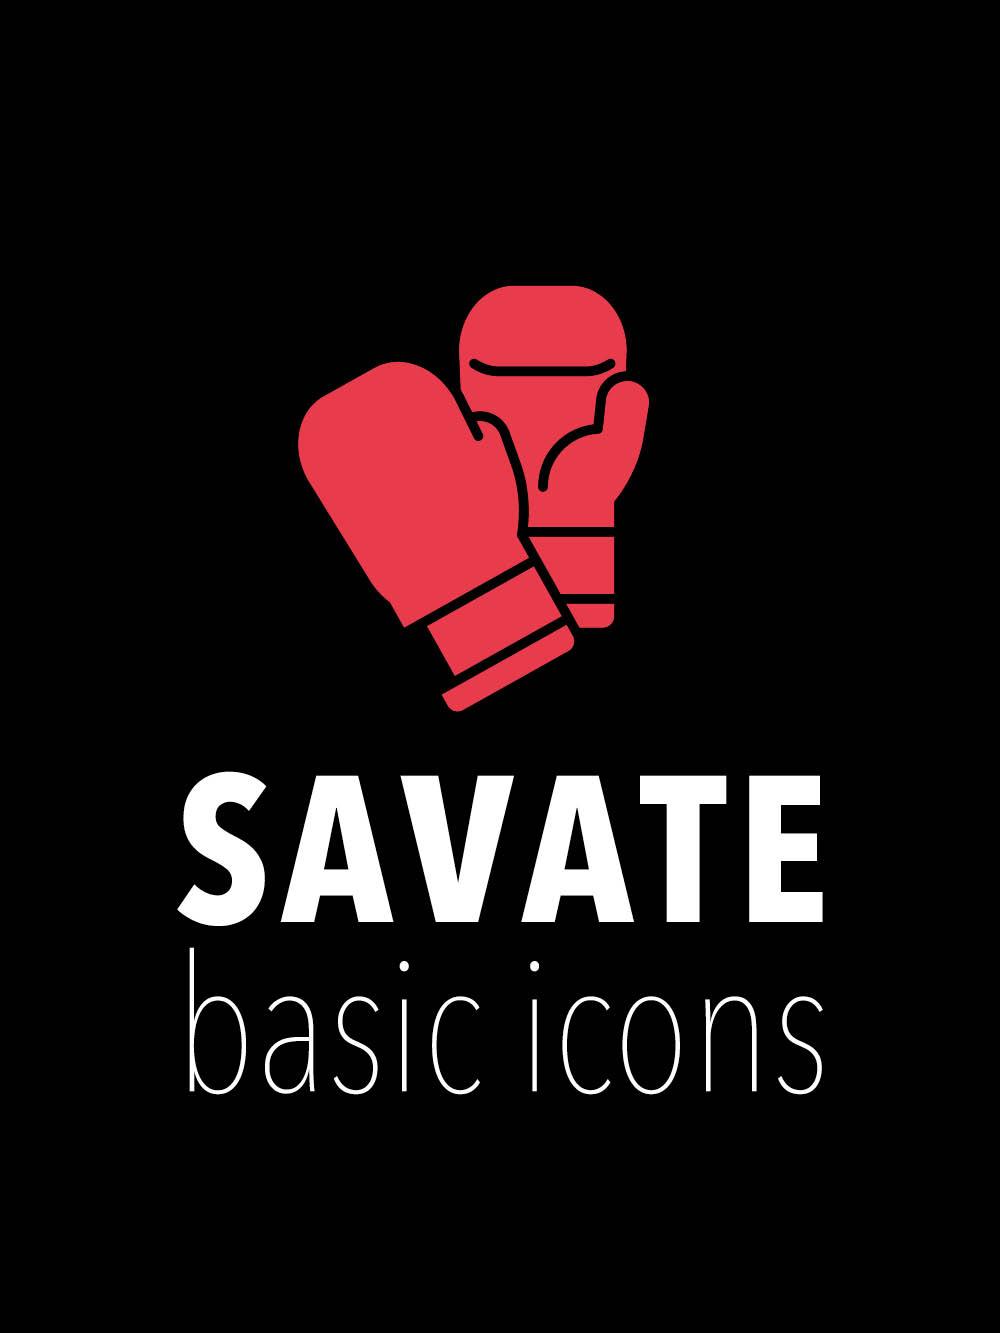 savate-bf-basic-icons-couv